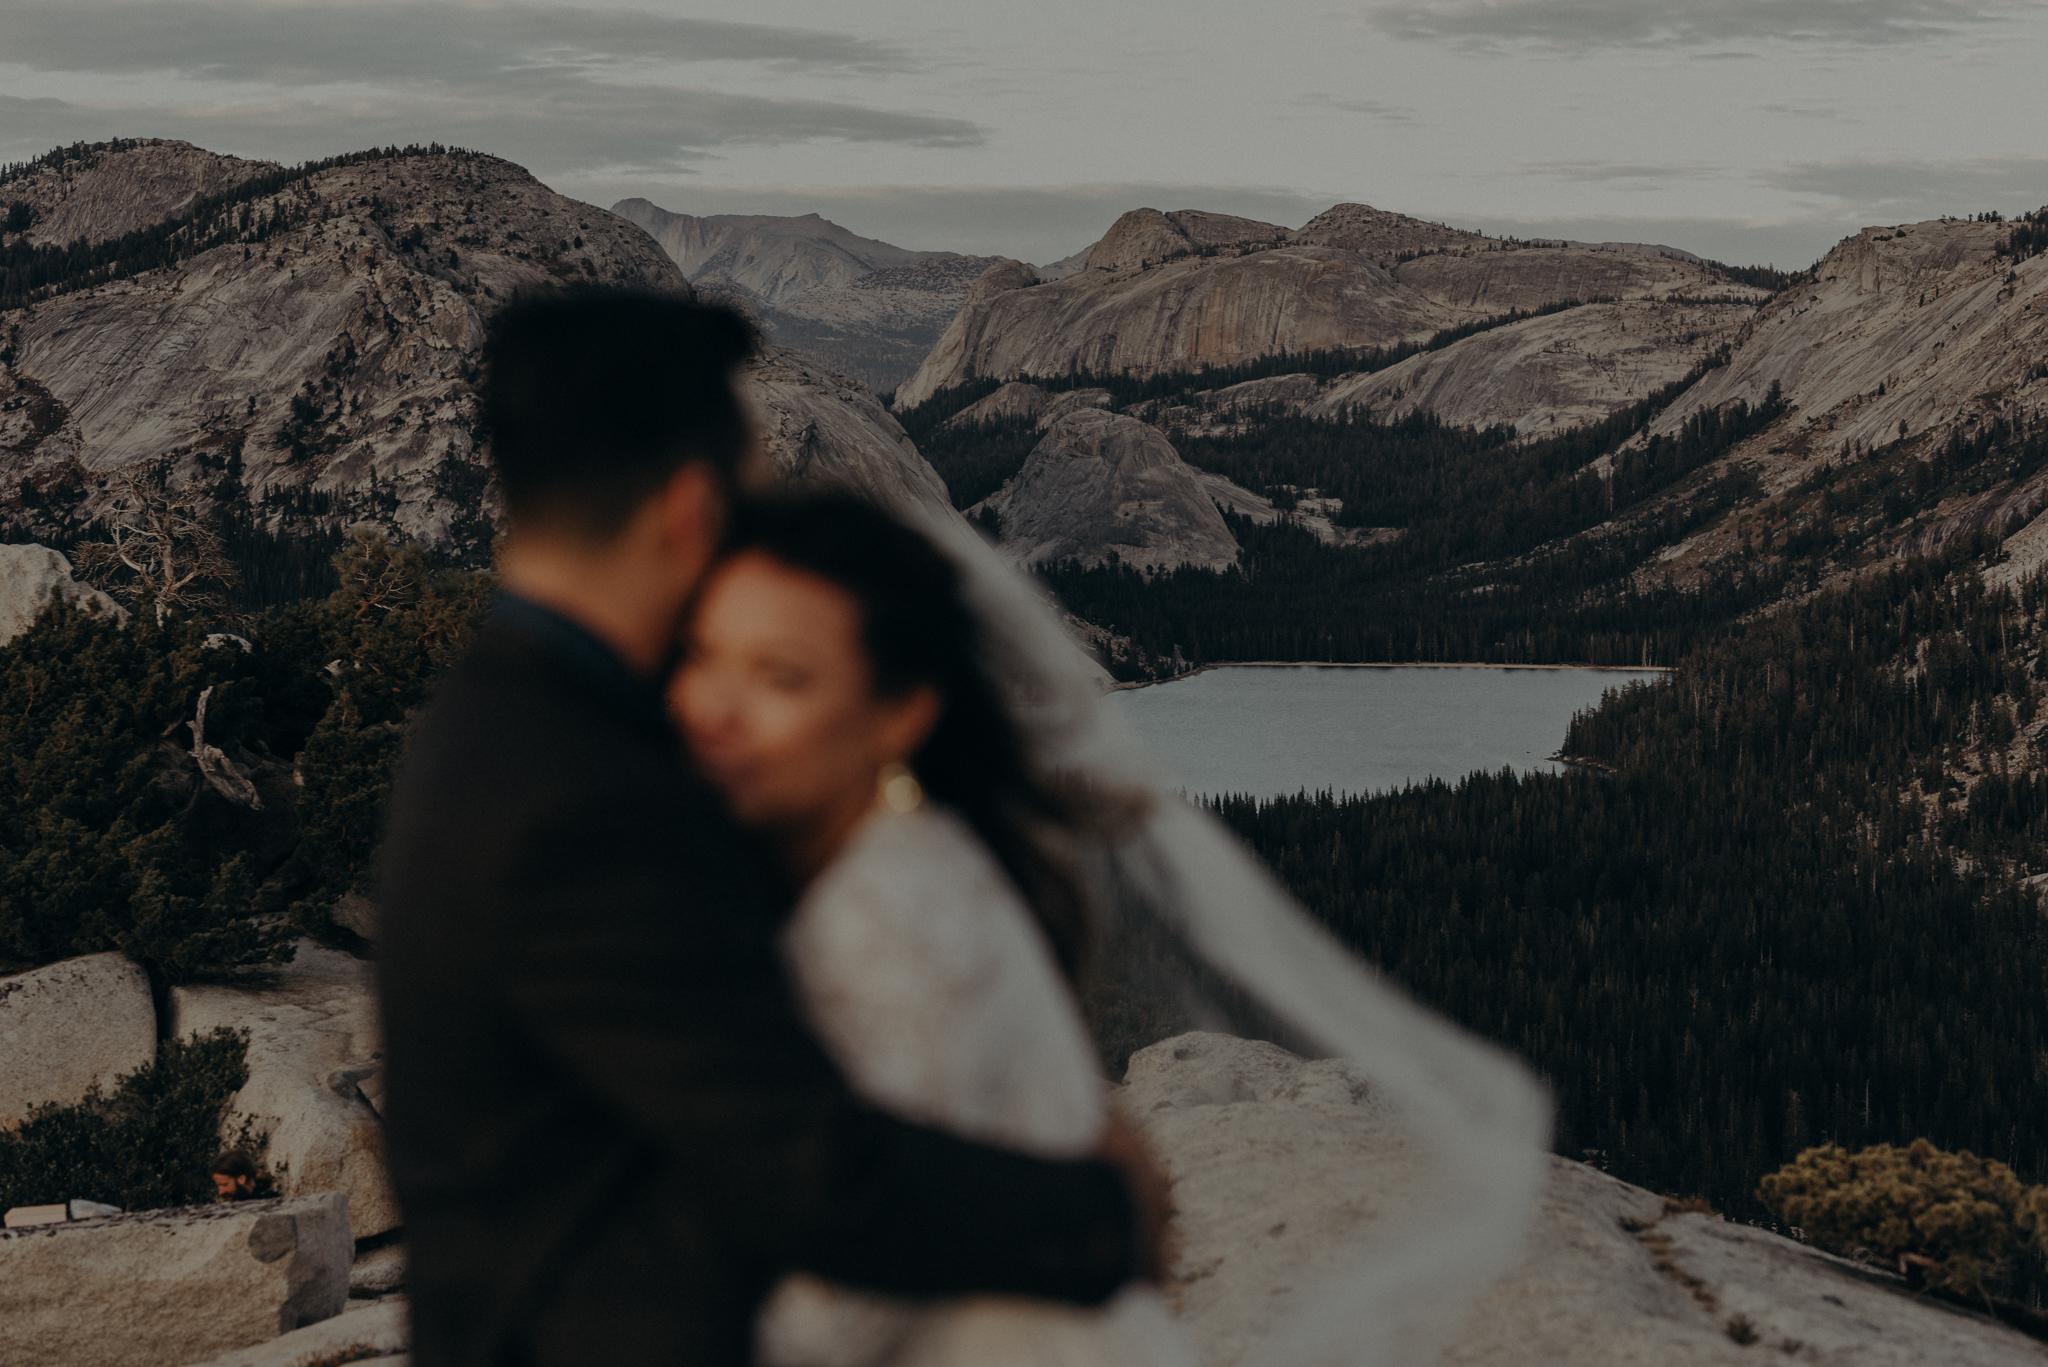 Yosemite Elopement Photographer - Evergreen Lodge Wedding Photographer - IsaiahAndTaylor.com-041.jpg